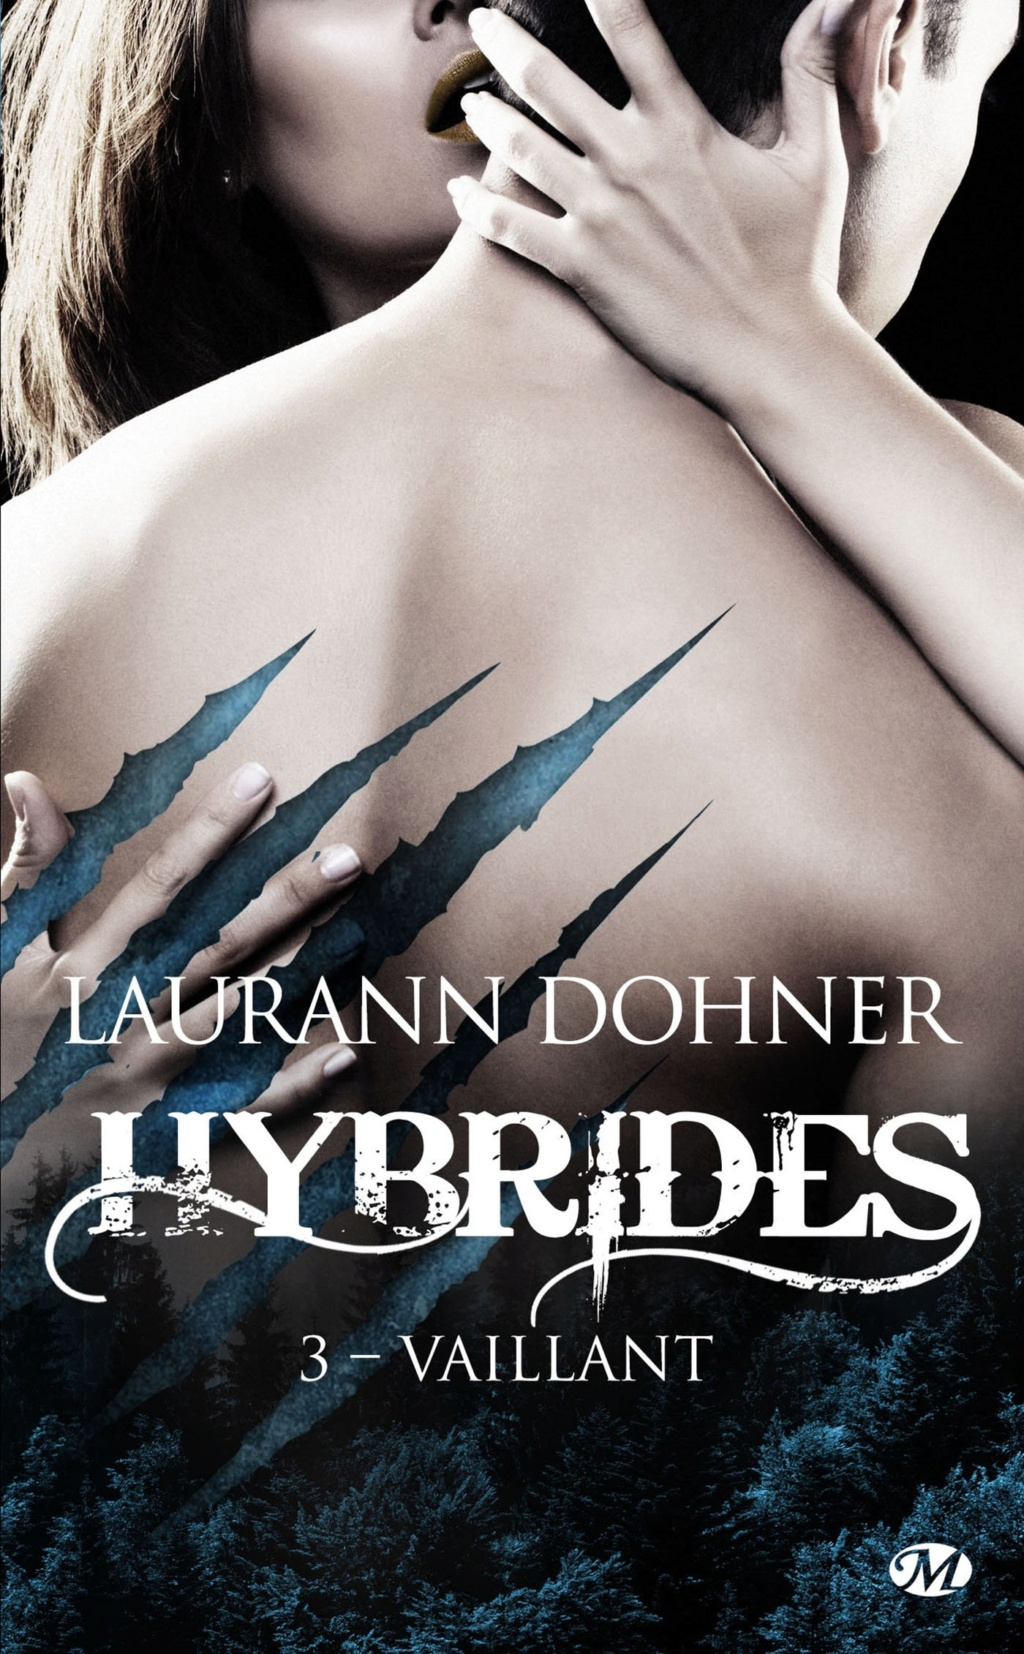 DOHNER Laurann - HYBRIDES - Tome 3 : Vaillant Hybrid10